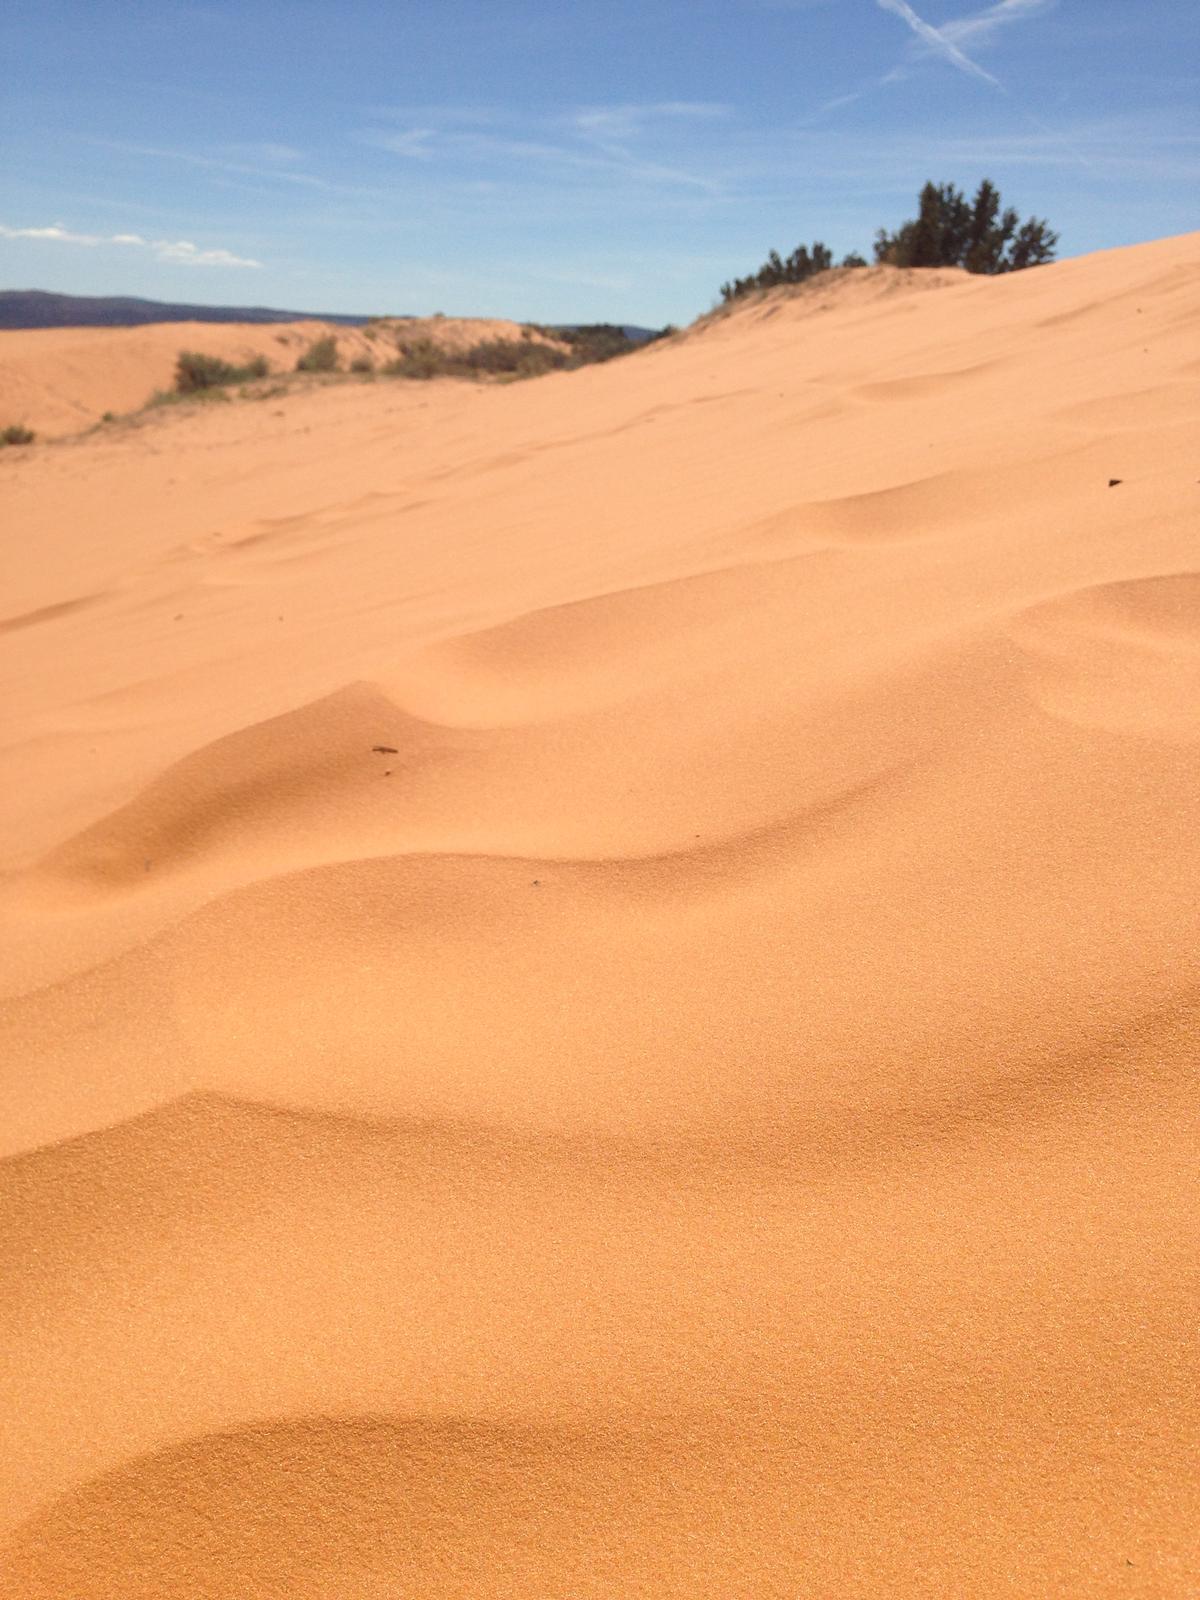 """If you can dream it, you can do it."" - Coral Pink Sand Dunes - tma kde platí ""kde sa piesok lial..."" ten piesok bol neuveriteľný!"